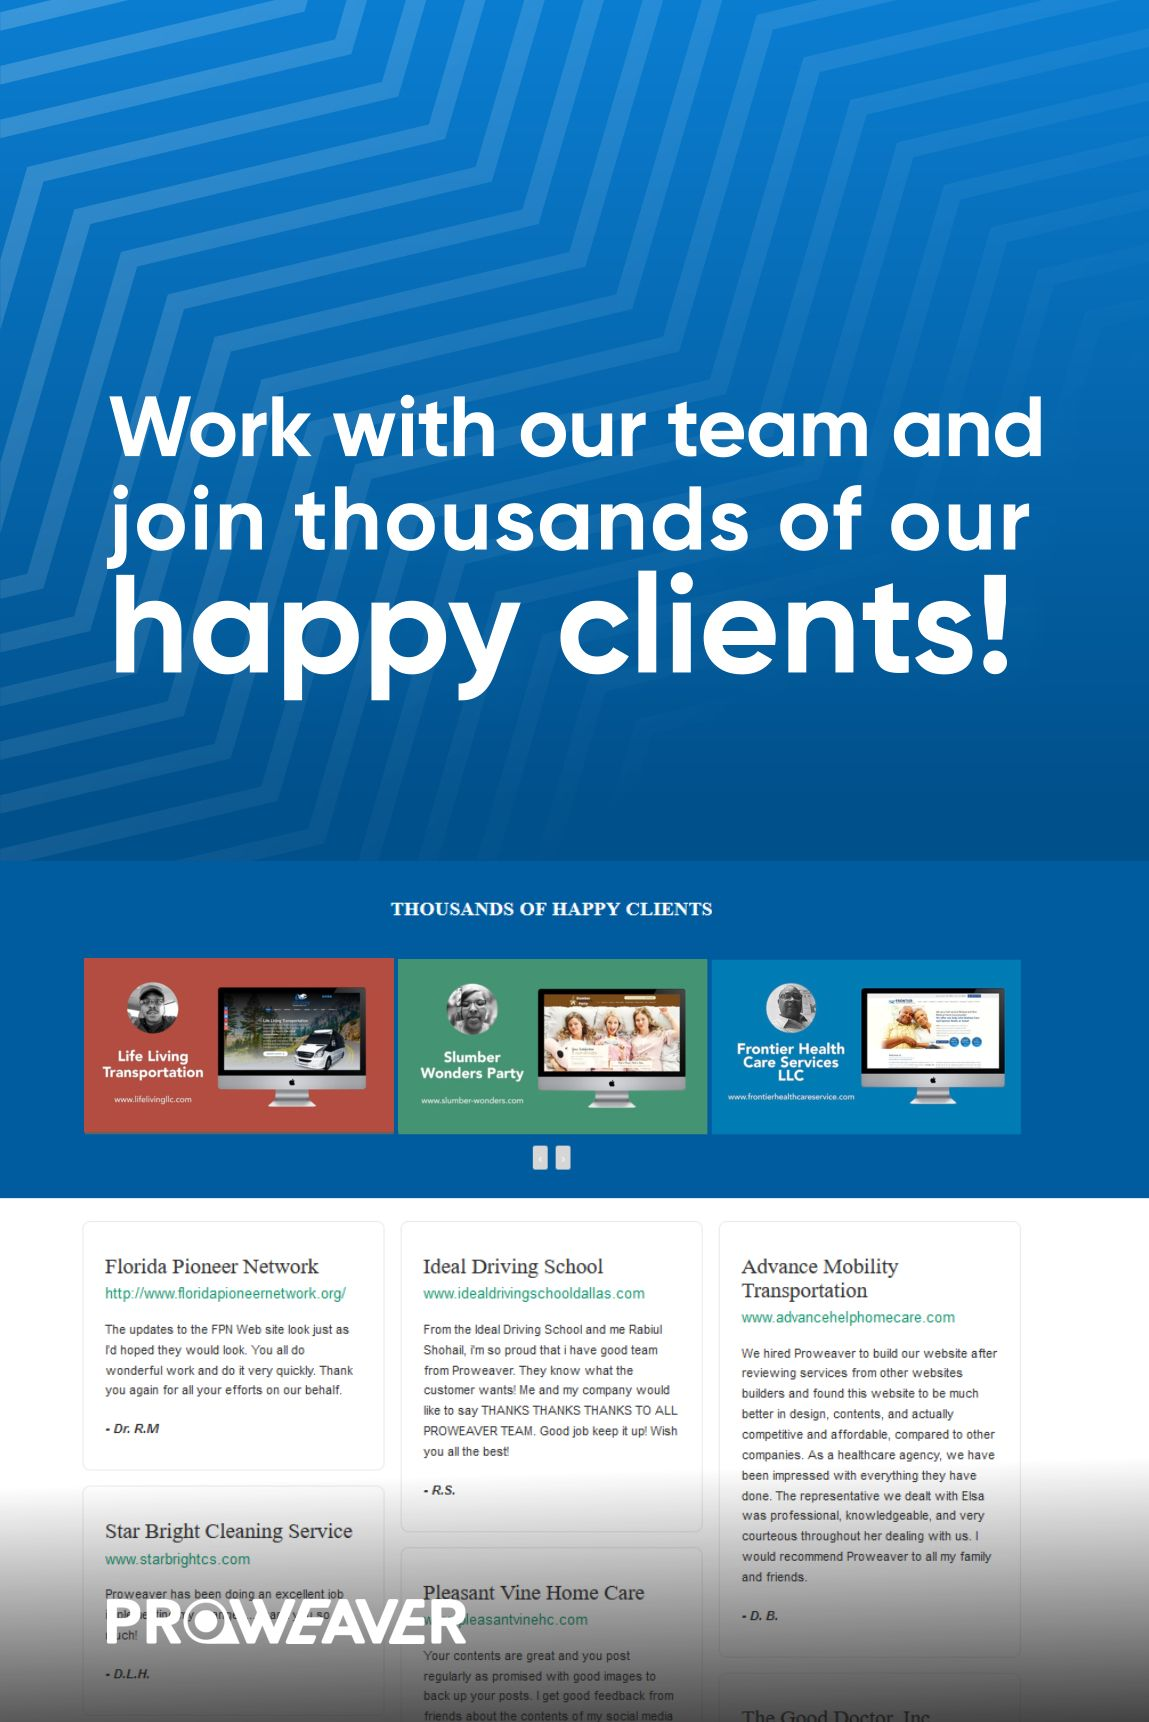 Custom Web Design Affordable Free Layout Proweaver Inc In 2020 Web Design Custom Web Design Custom Website Design